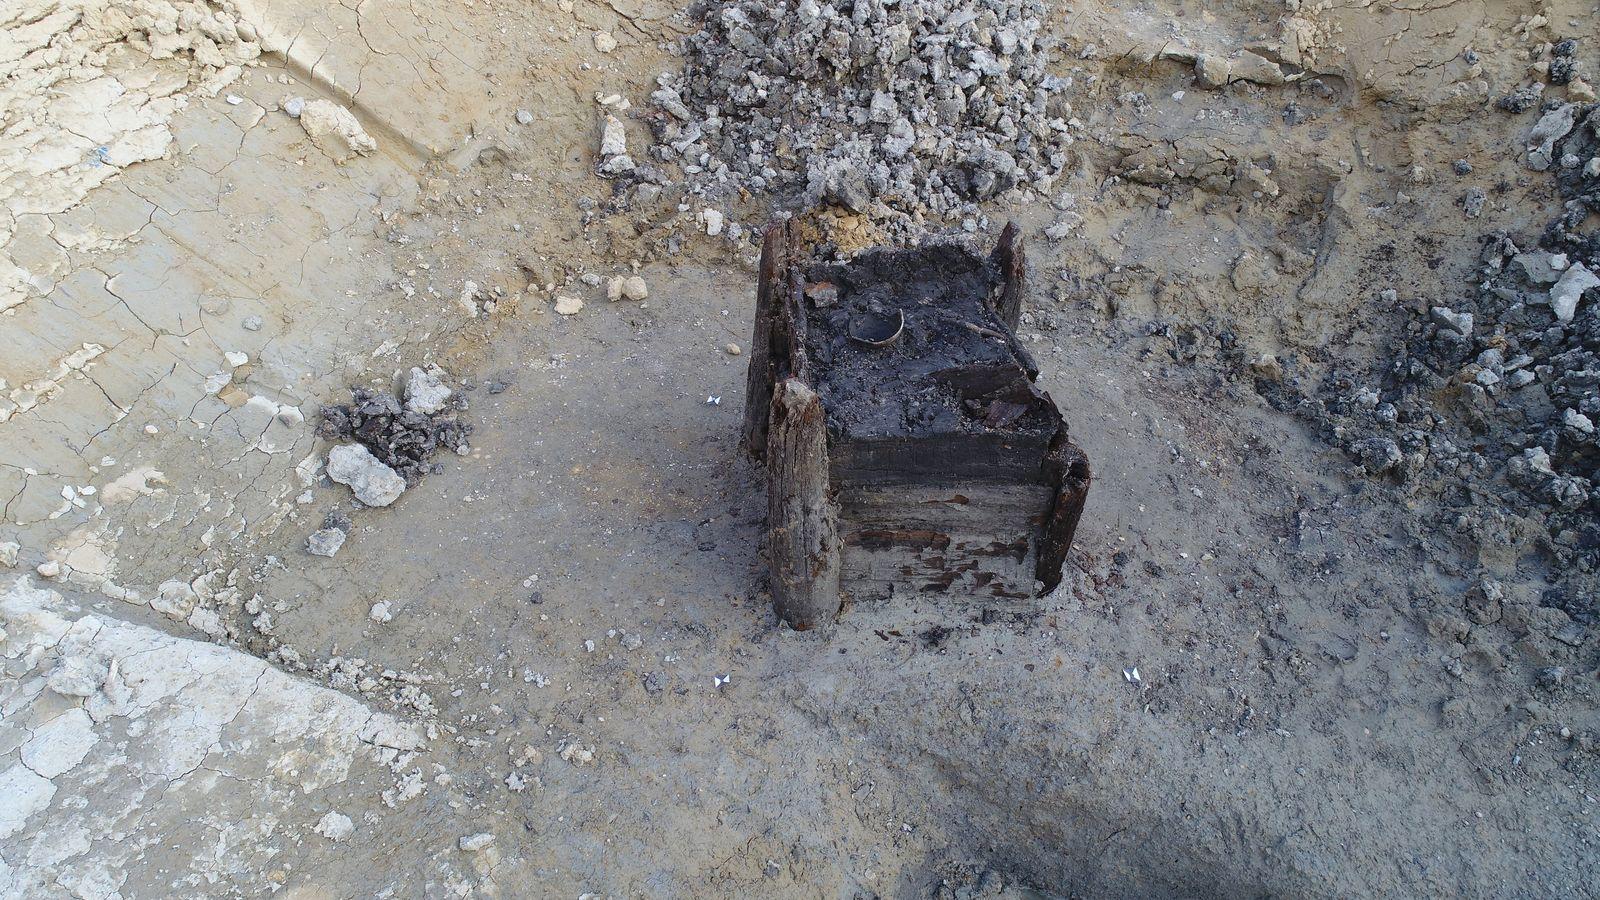 7300 Jahre alter Holzbrunnen entdeckt